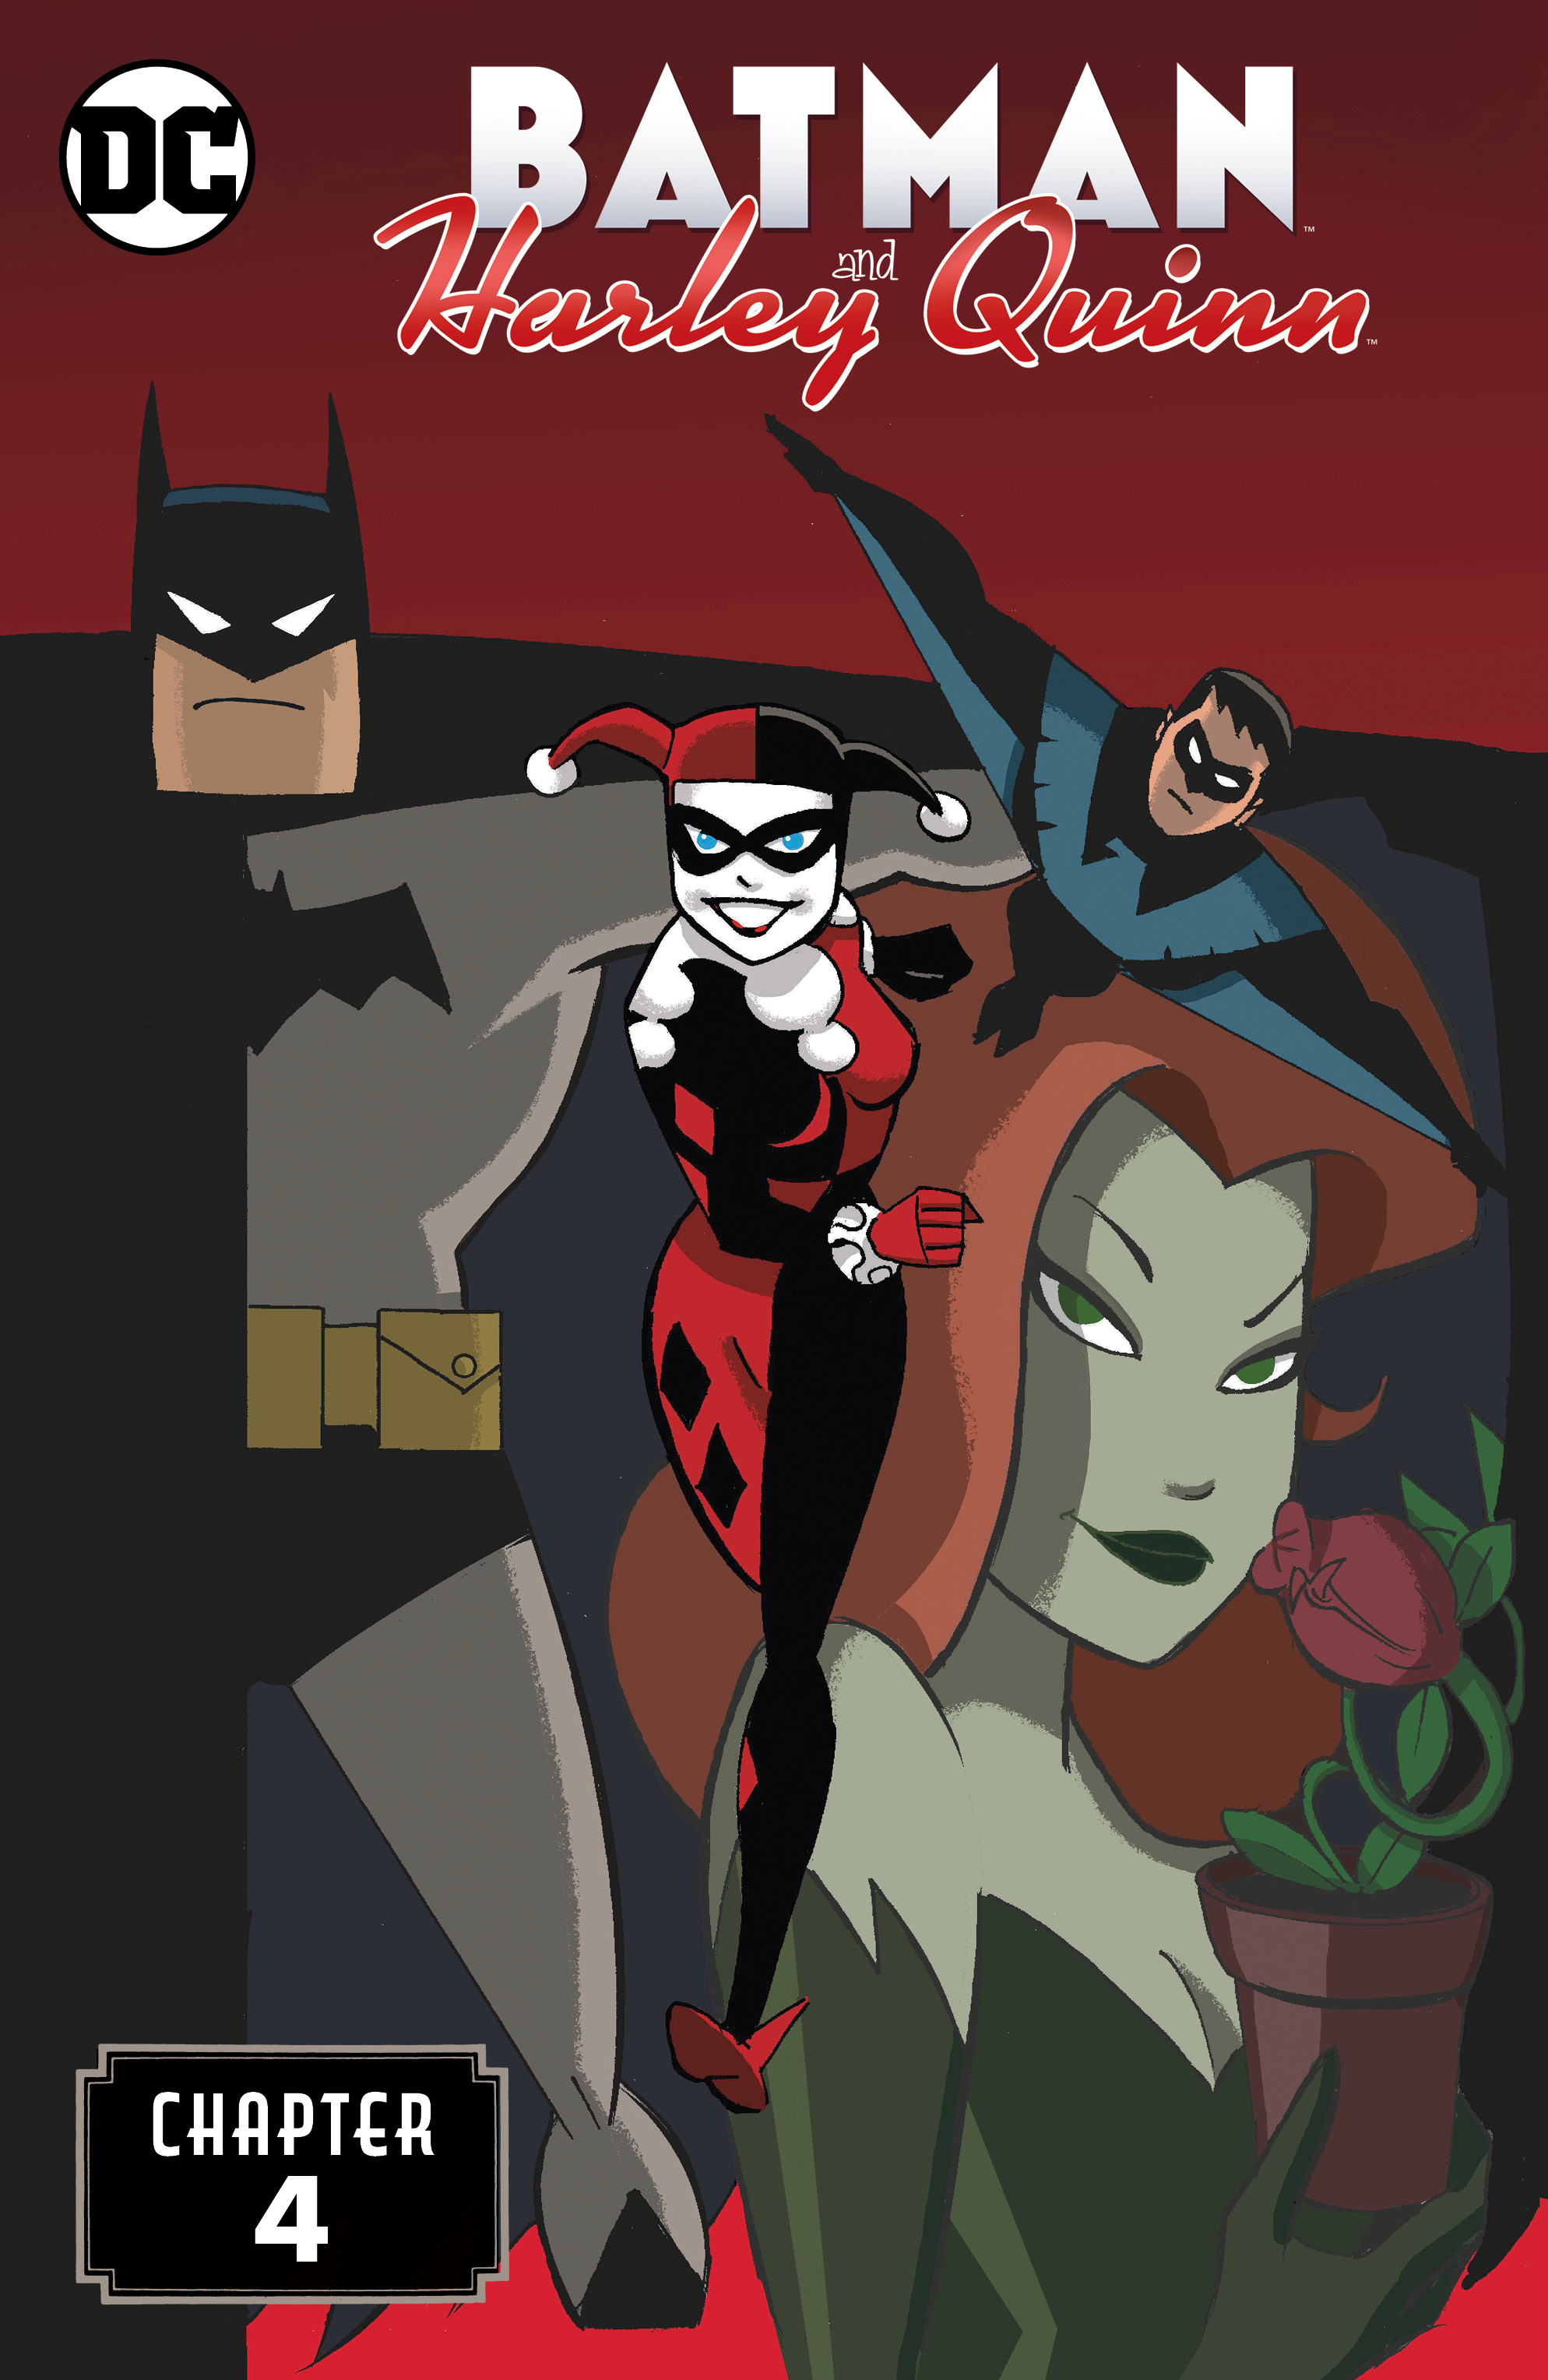 Batman and Harley Quinn Vol 1 4 (Digital)